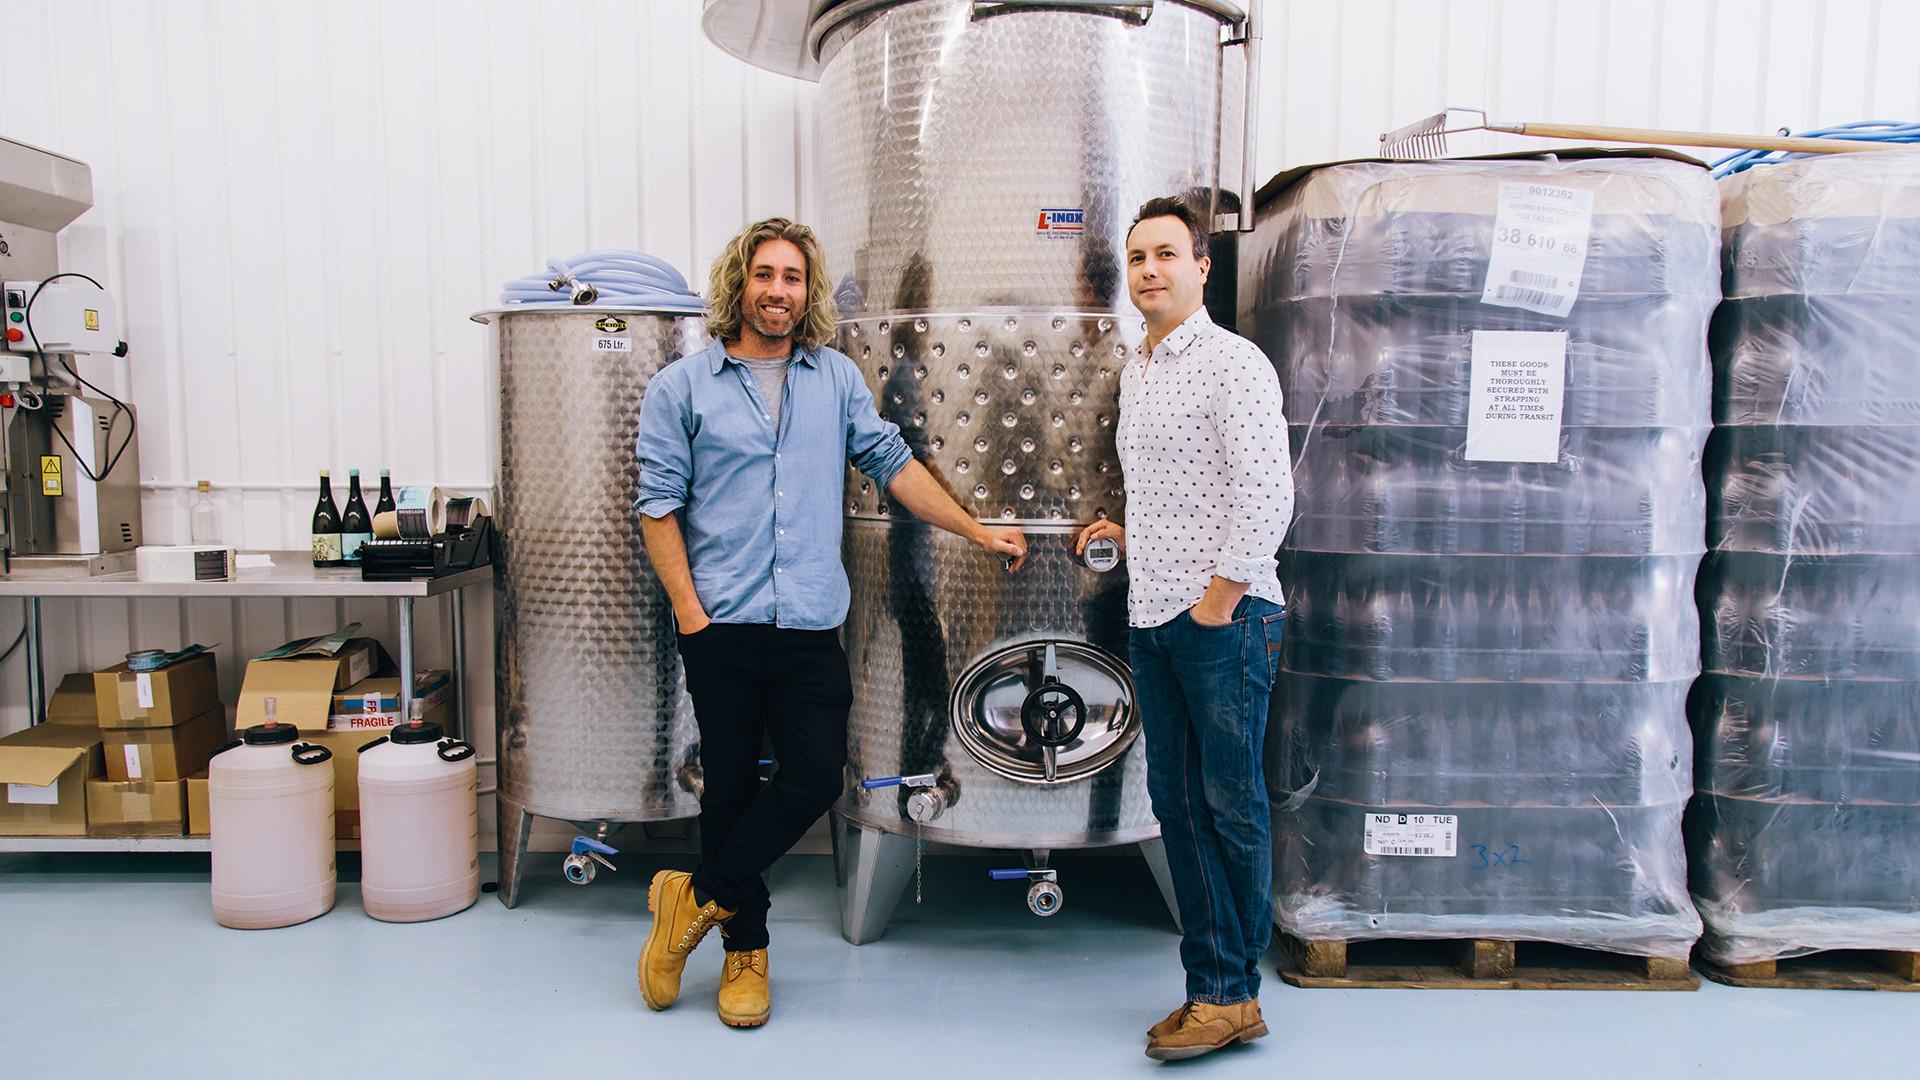 Warwick Smith and winemaker Josh Hammond, owners of Rengade London Wine